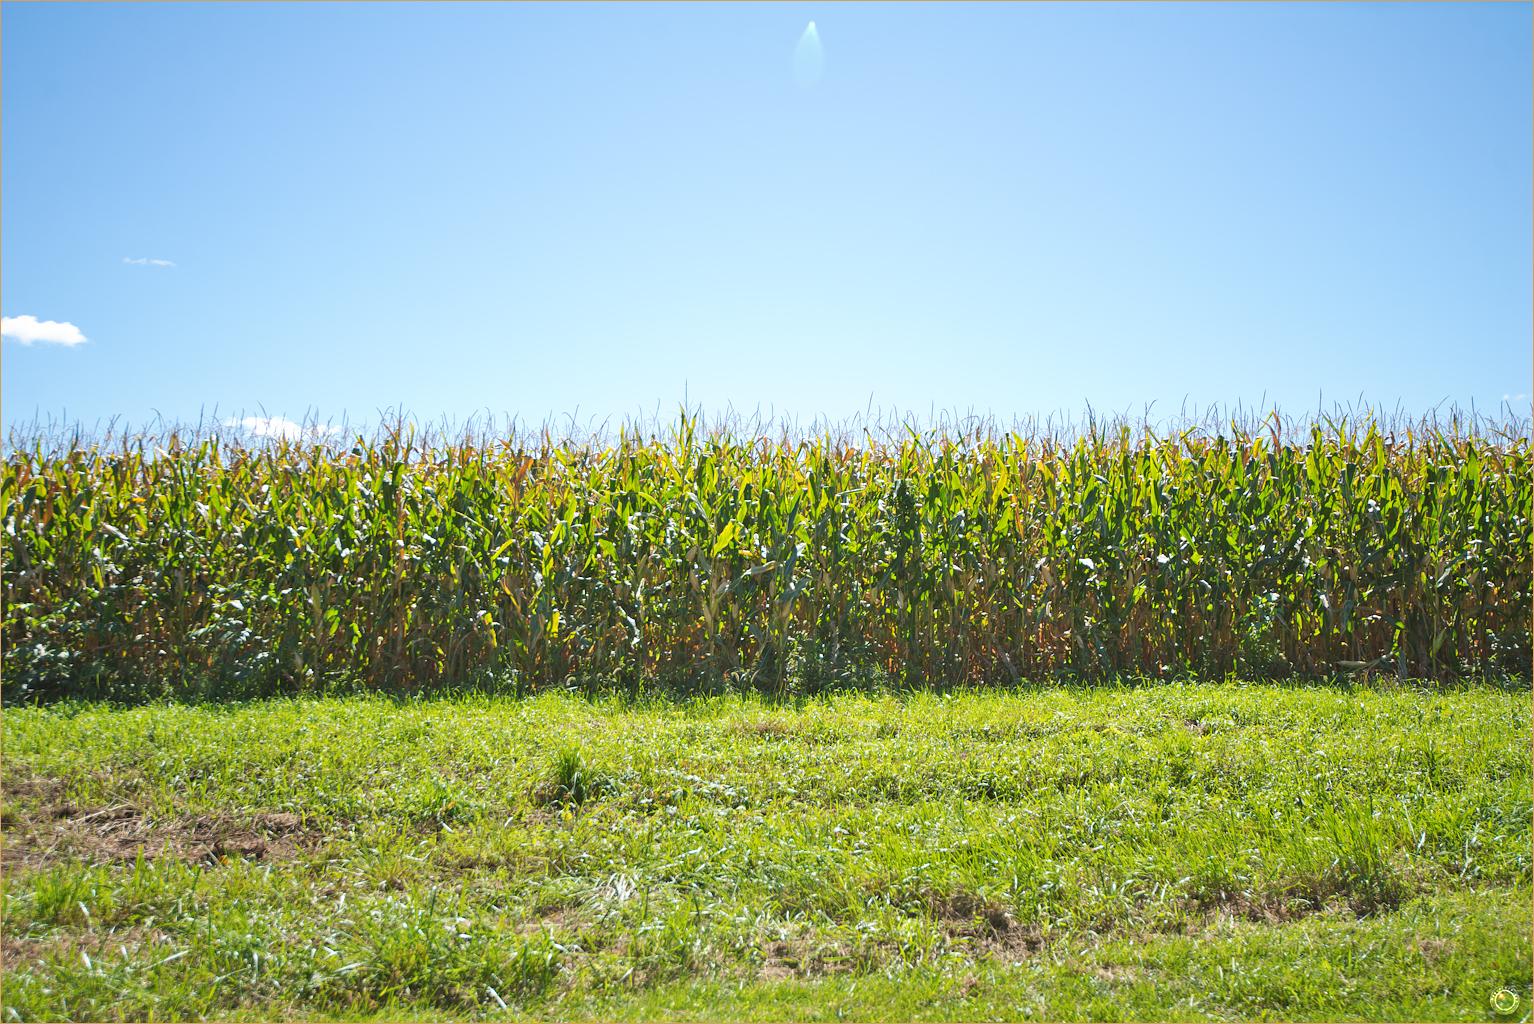 176 Wyalusing State Park Corn Field